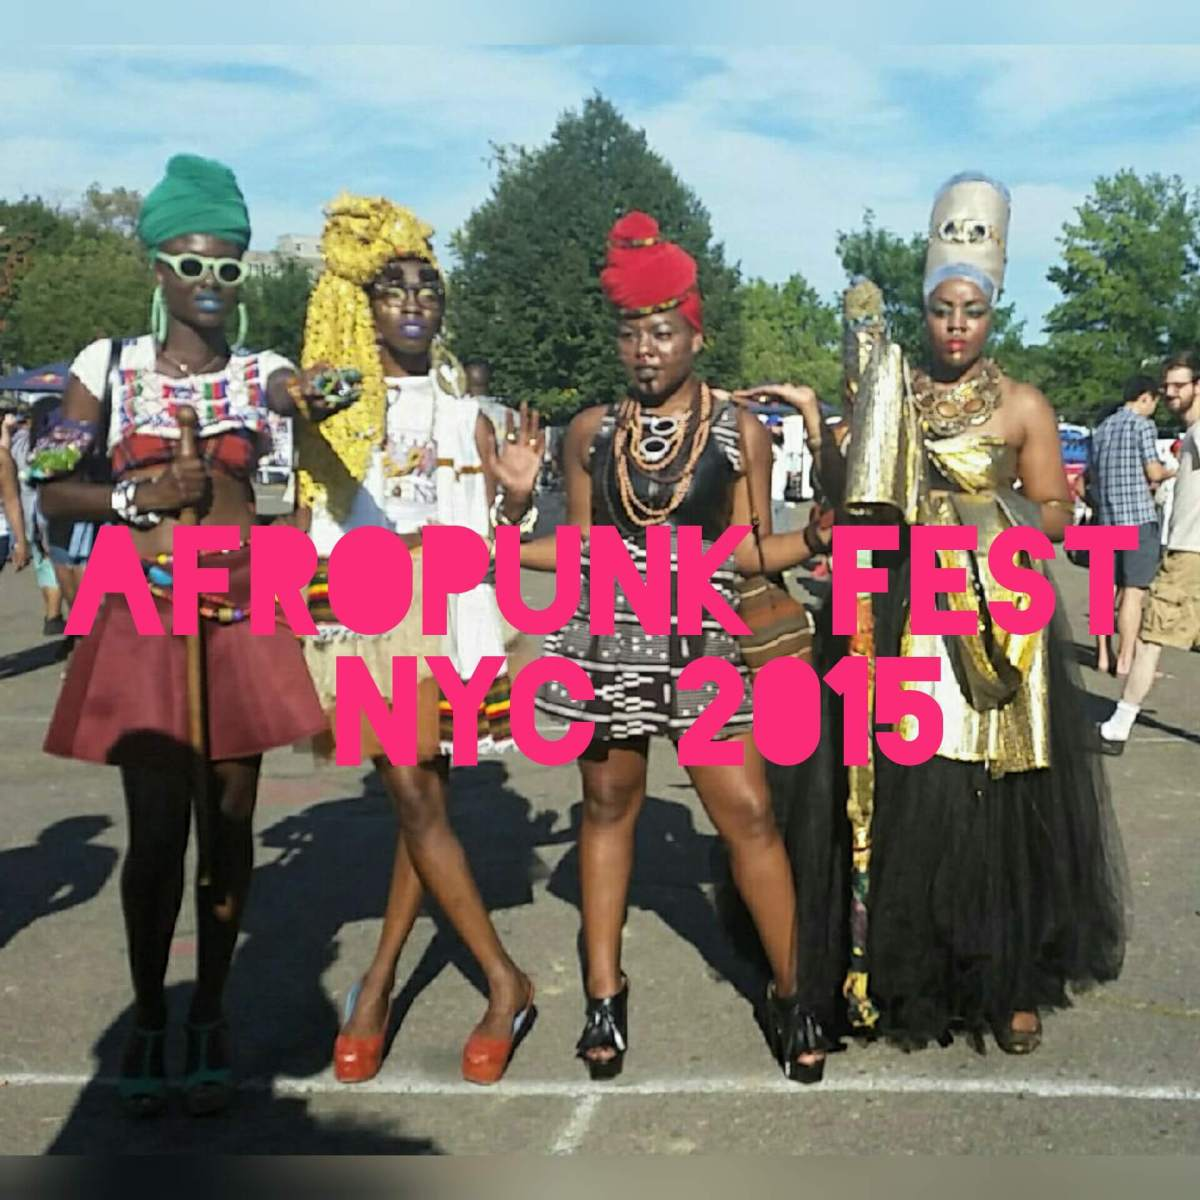 AfroPunk Fest NYC